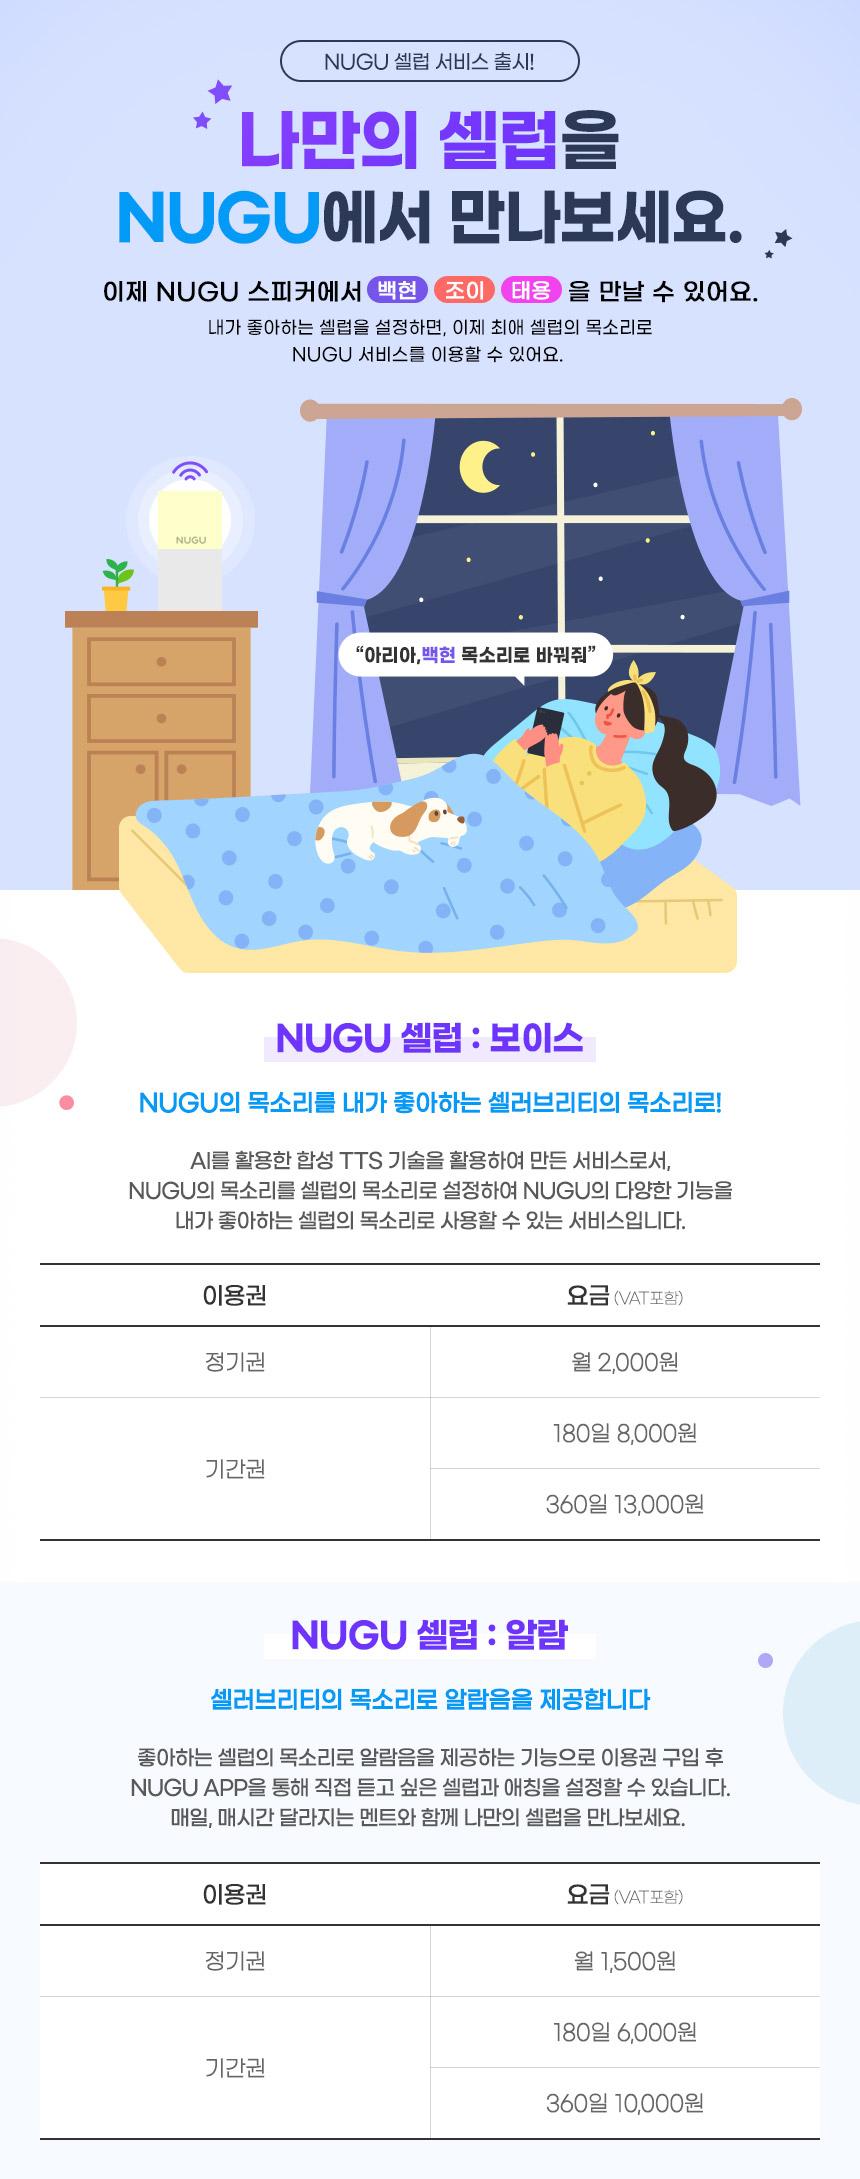 sk_nugu_celeb_event.jpg